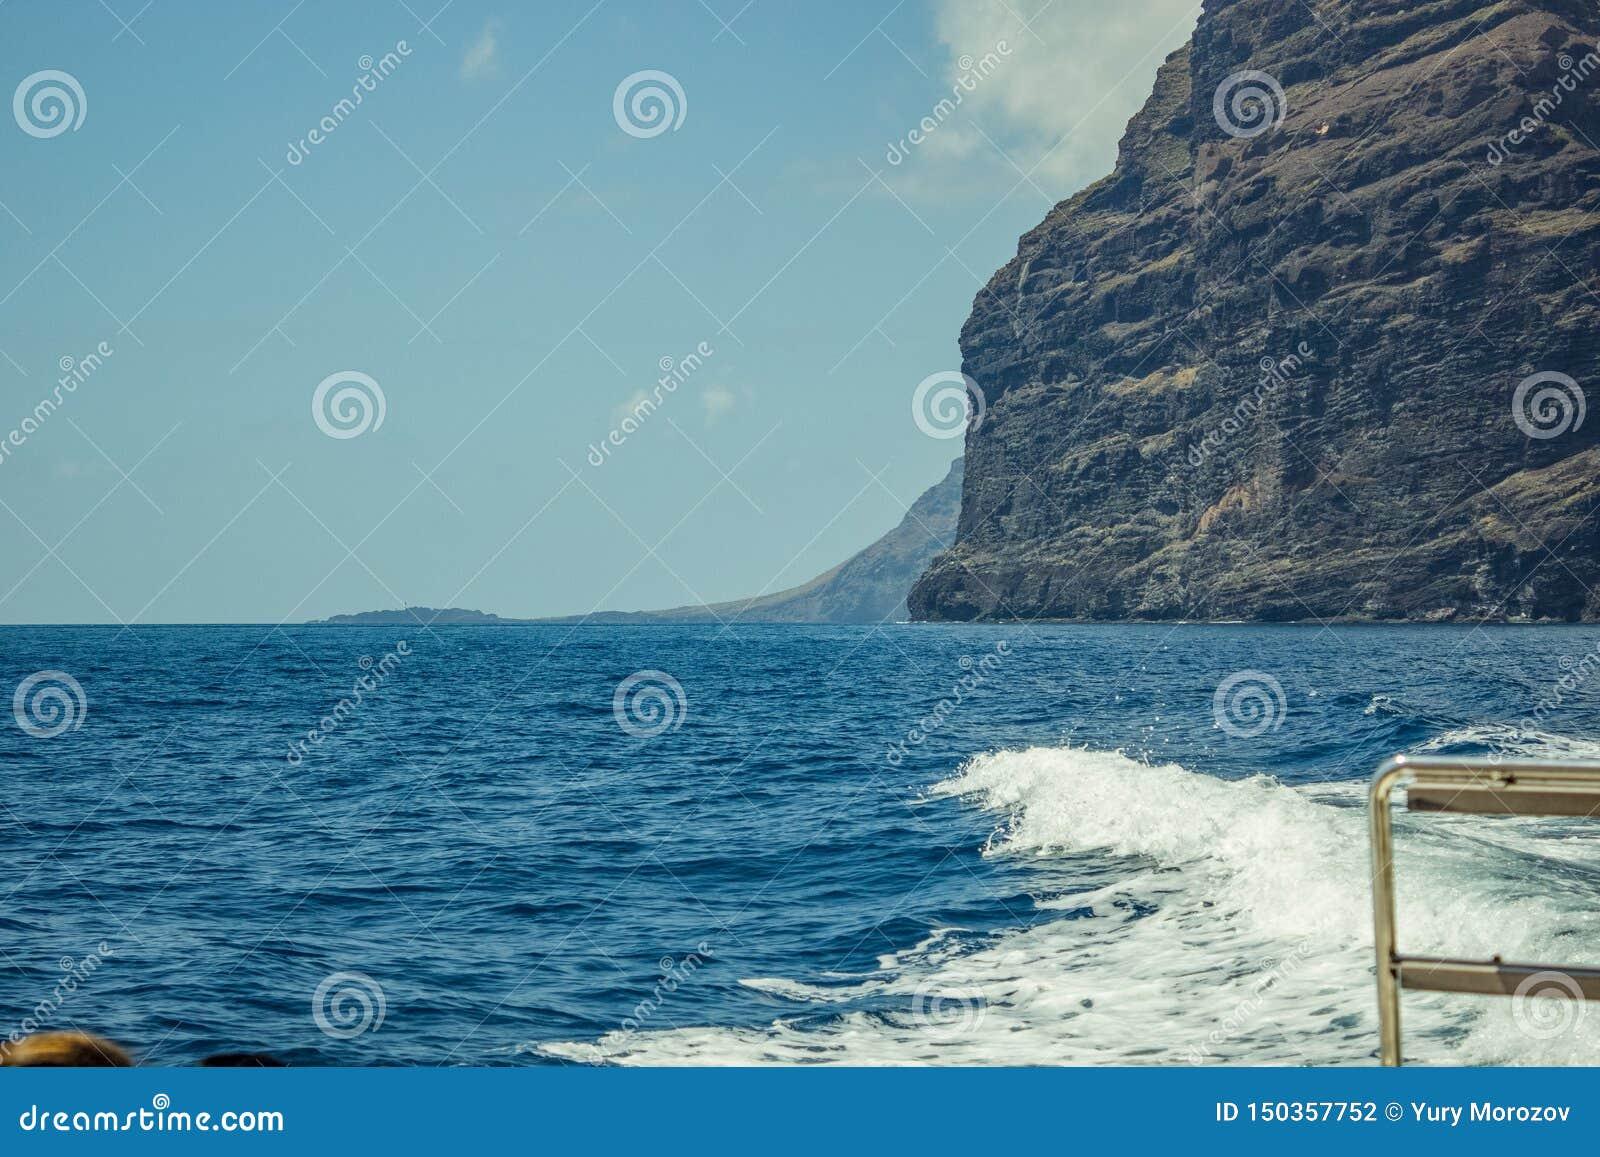 Steep high lava rock cliffs. Blue sea horizon, natural sky background